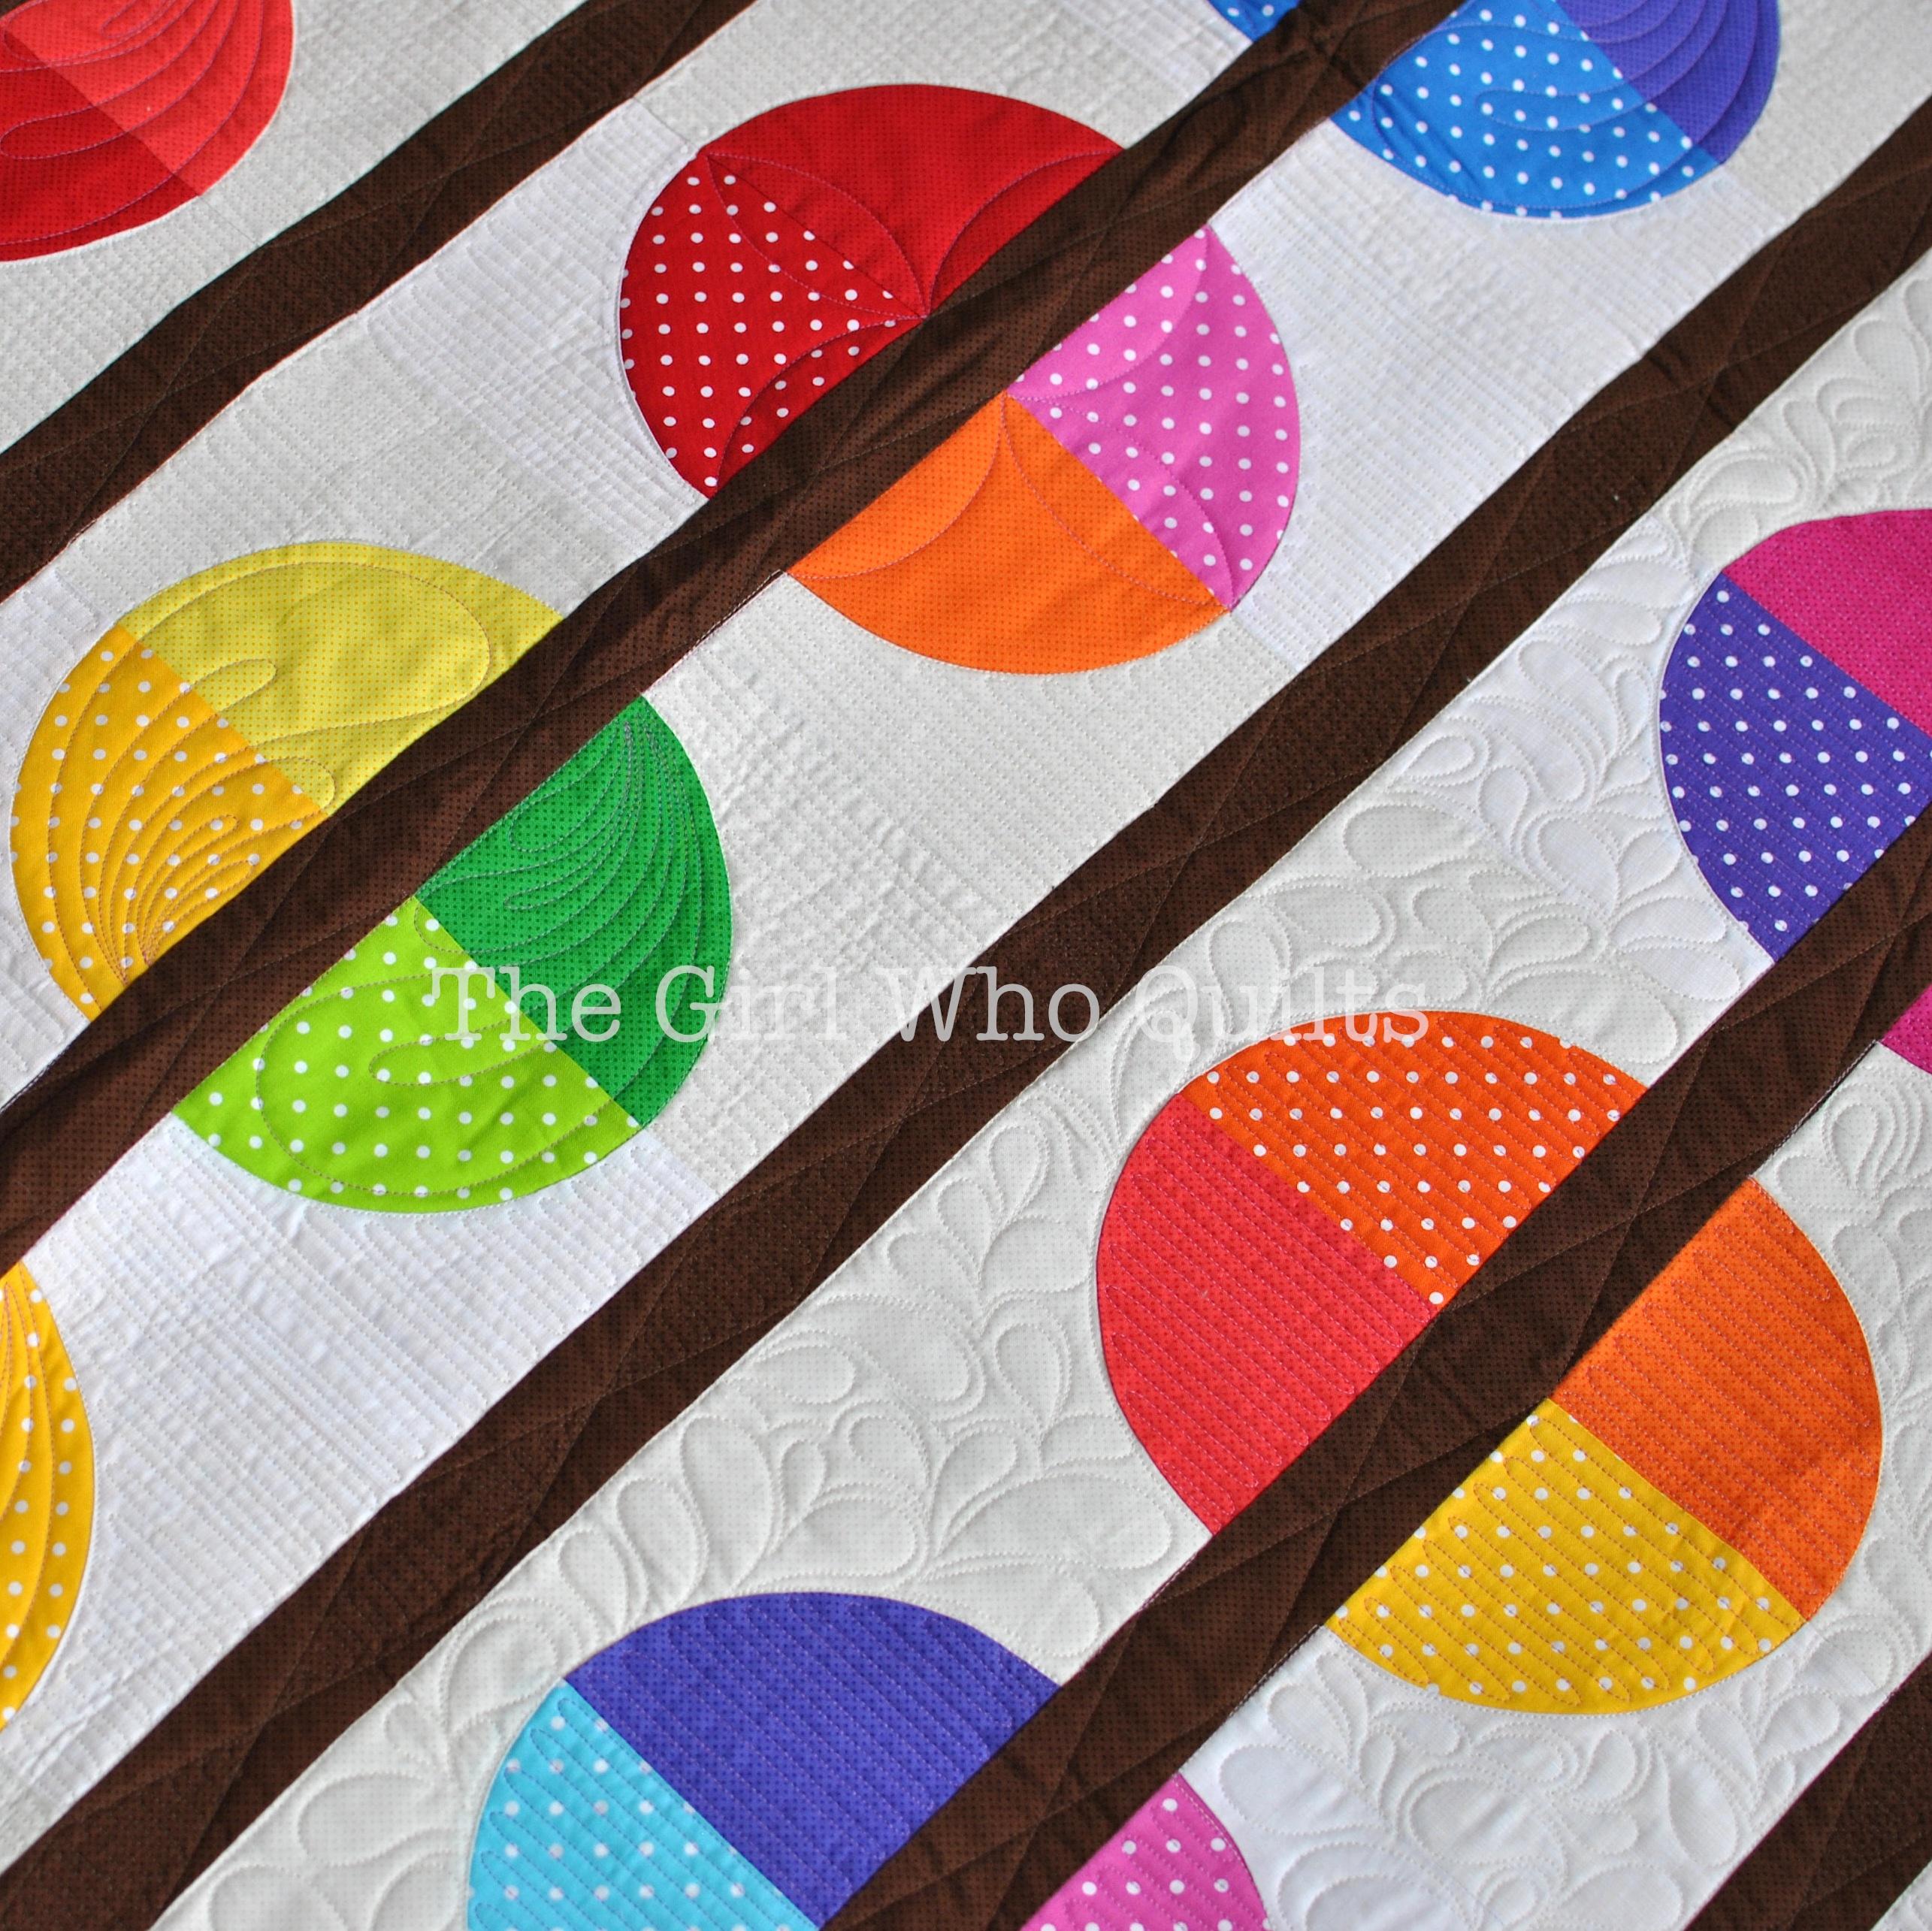 Beaded String quilt